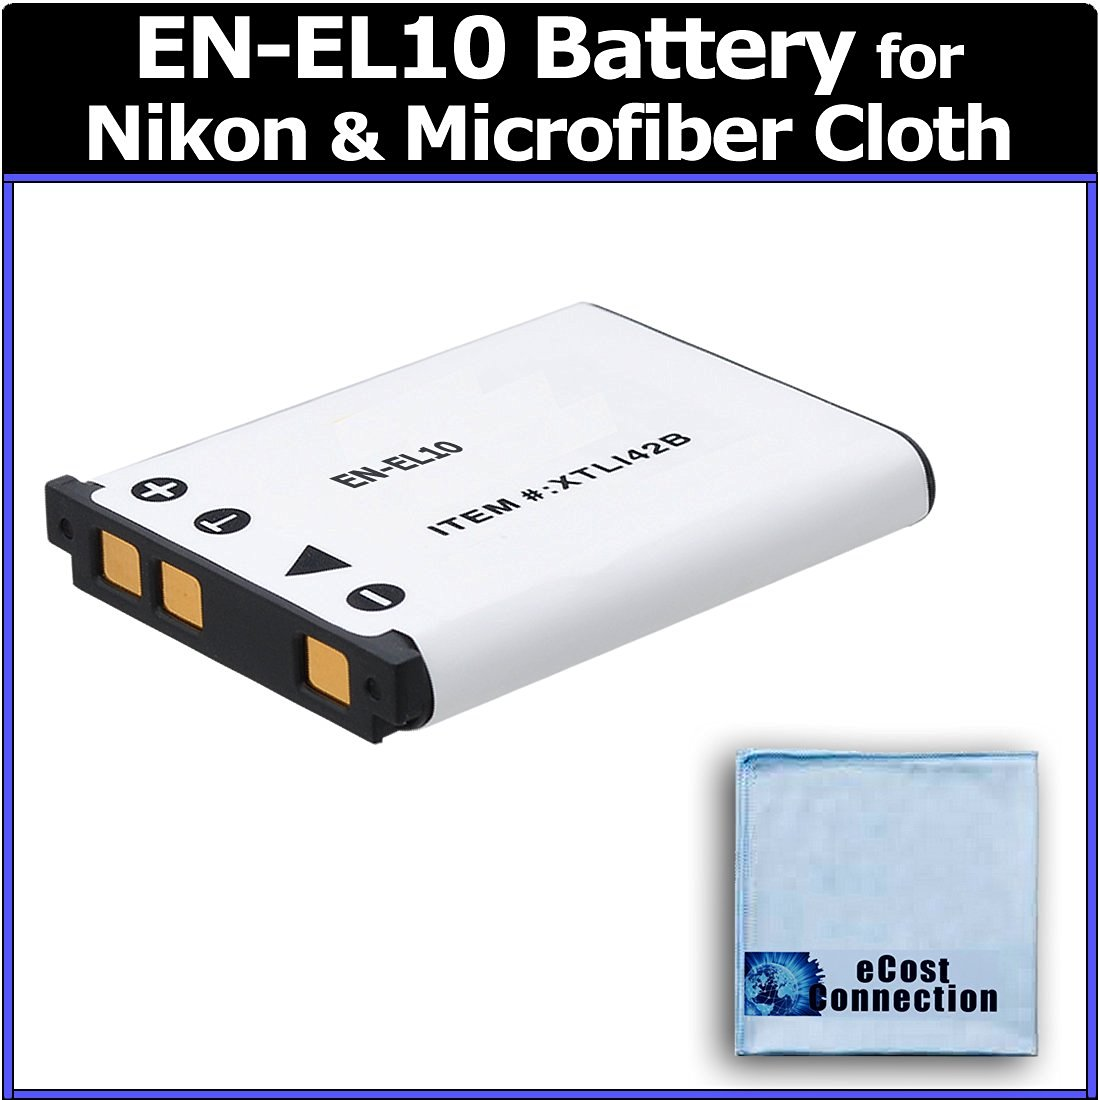 EN-EL10 Long Life Battery for Nikon Cameras and Camcorders: S60, S80, S200, S205, S210, S210, S220, S230, S500, S510, S520, S570, S600, S700, S3000, 3100, S3000, S4000, S5100 + eCostConnection Microfiber Cloth